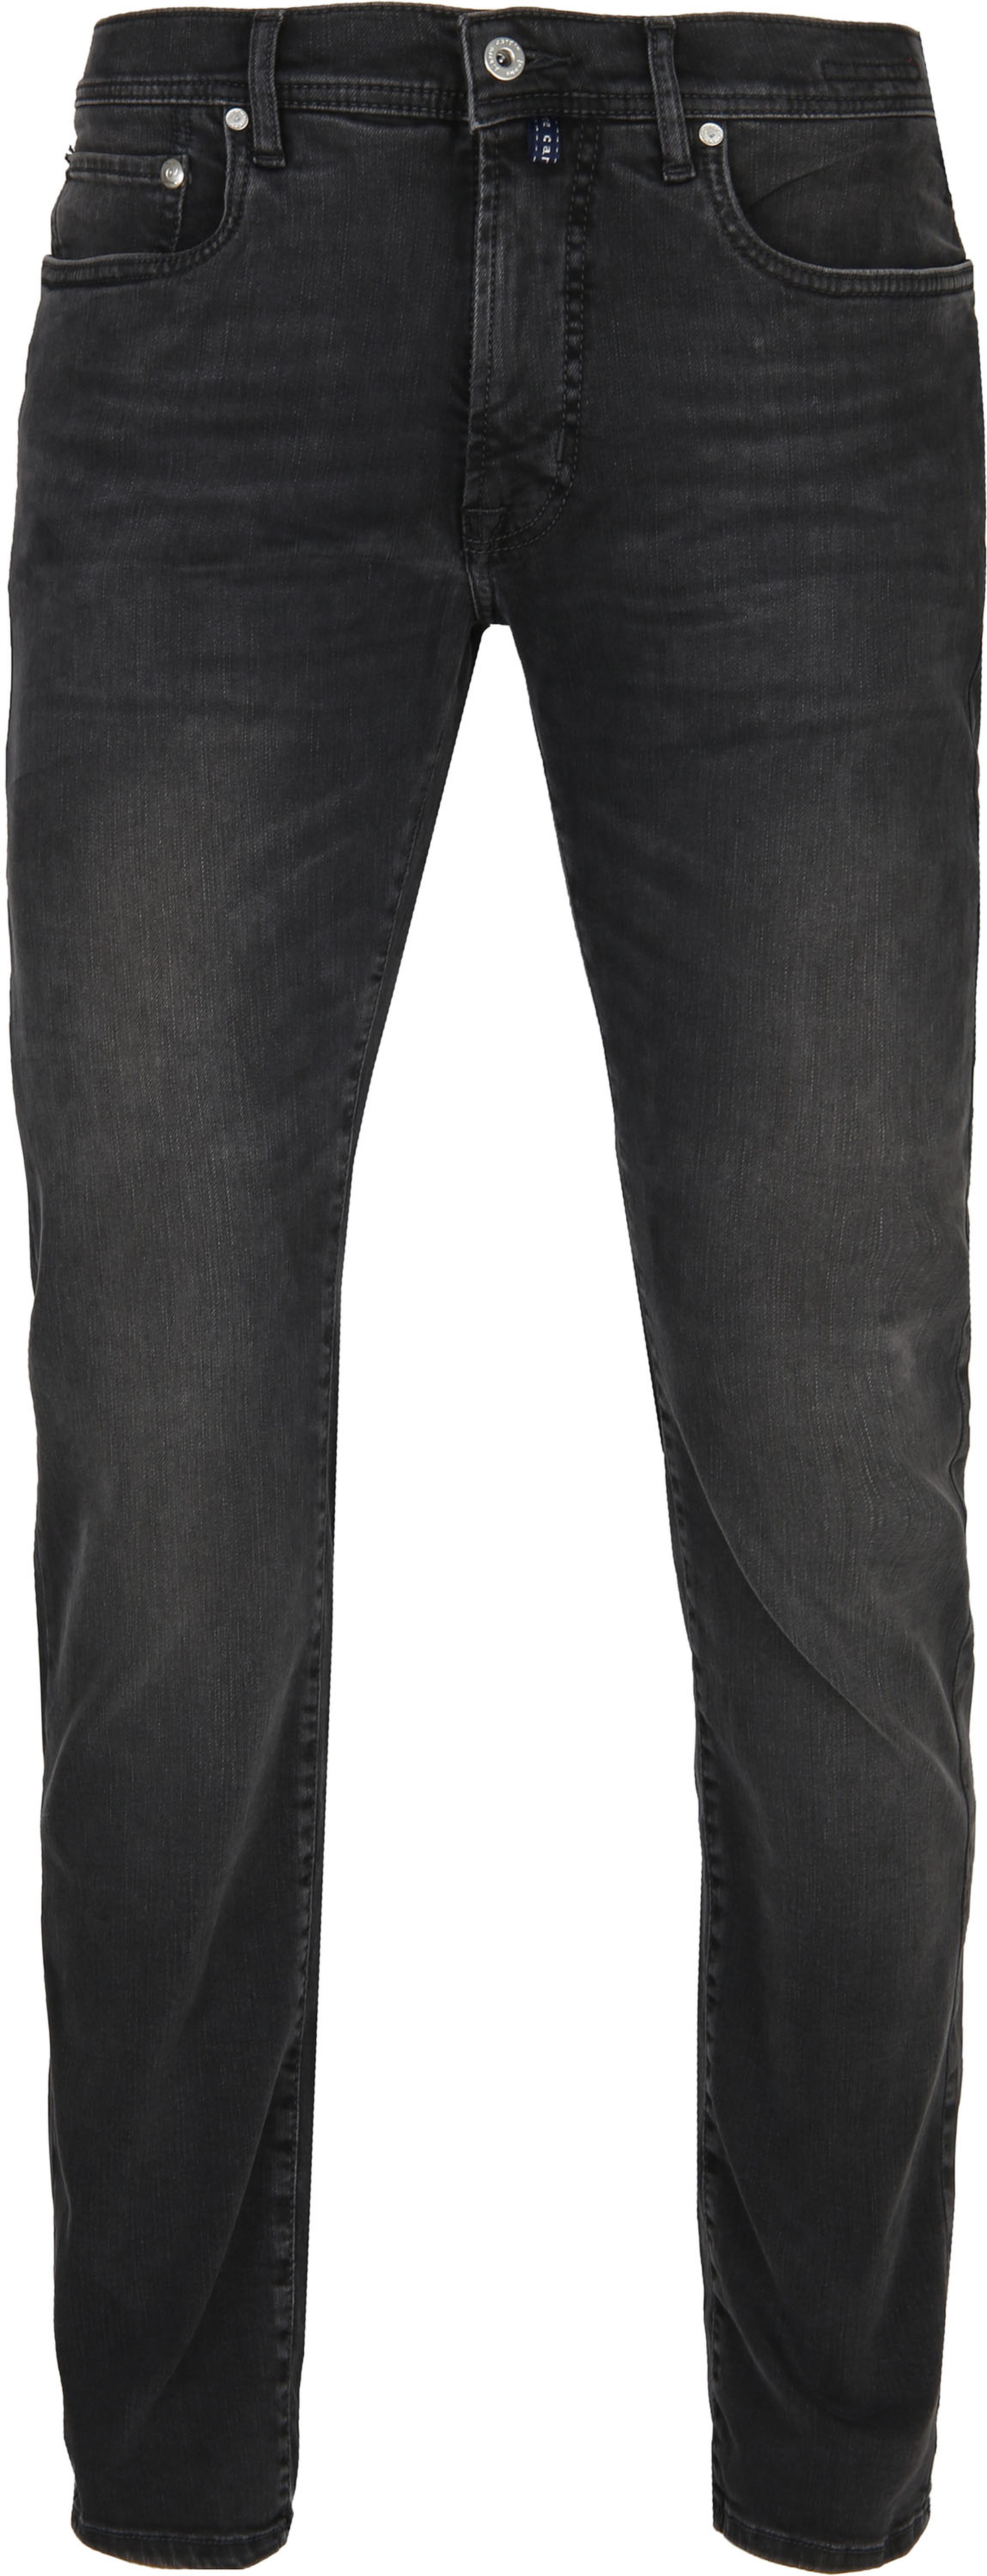 Pierre Cardin Antraciet Jeans Lyon